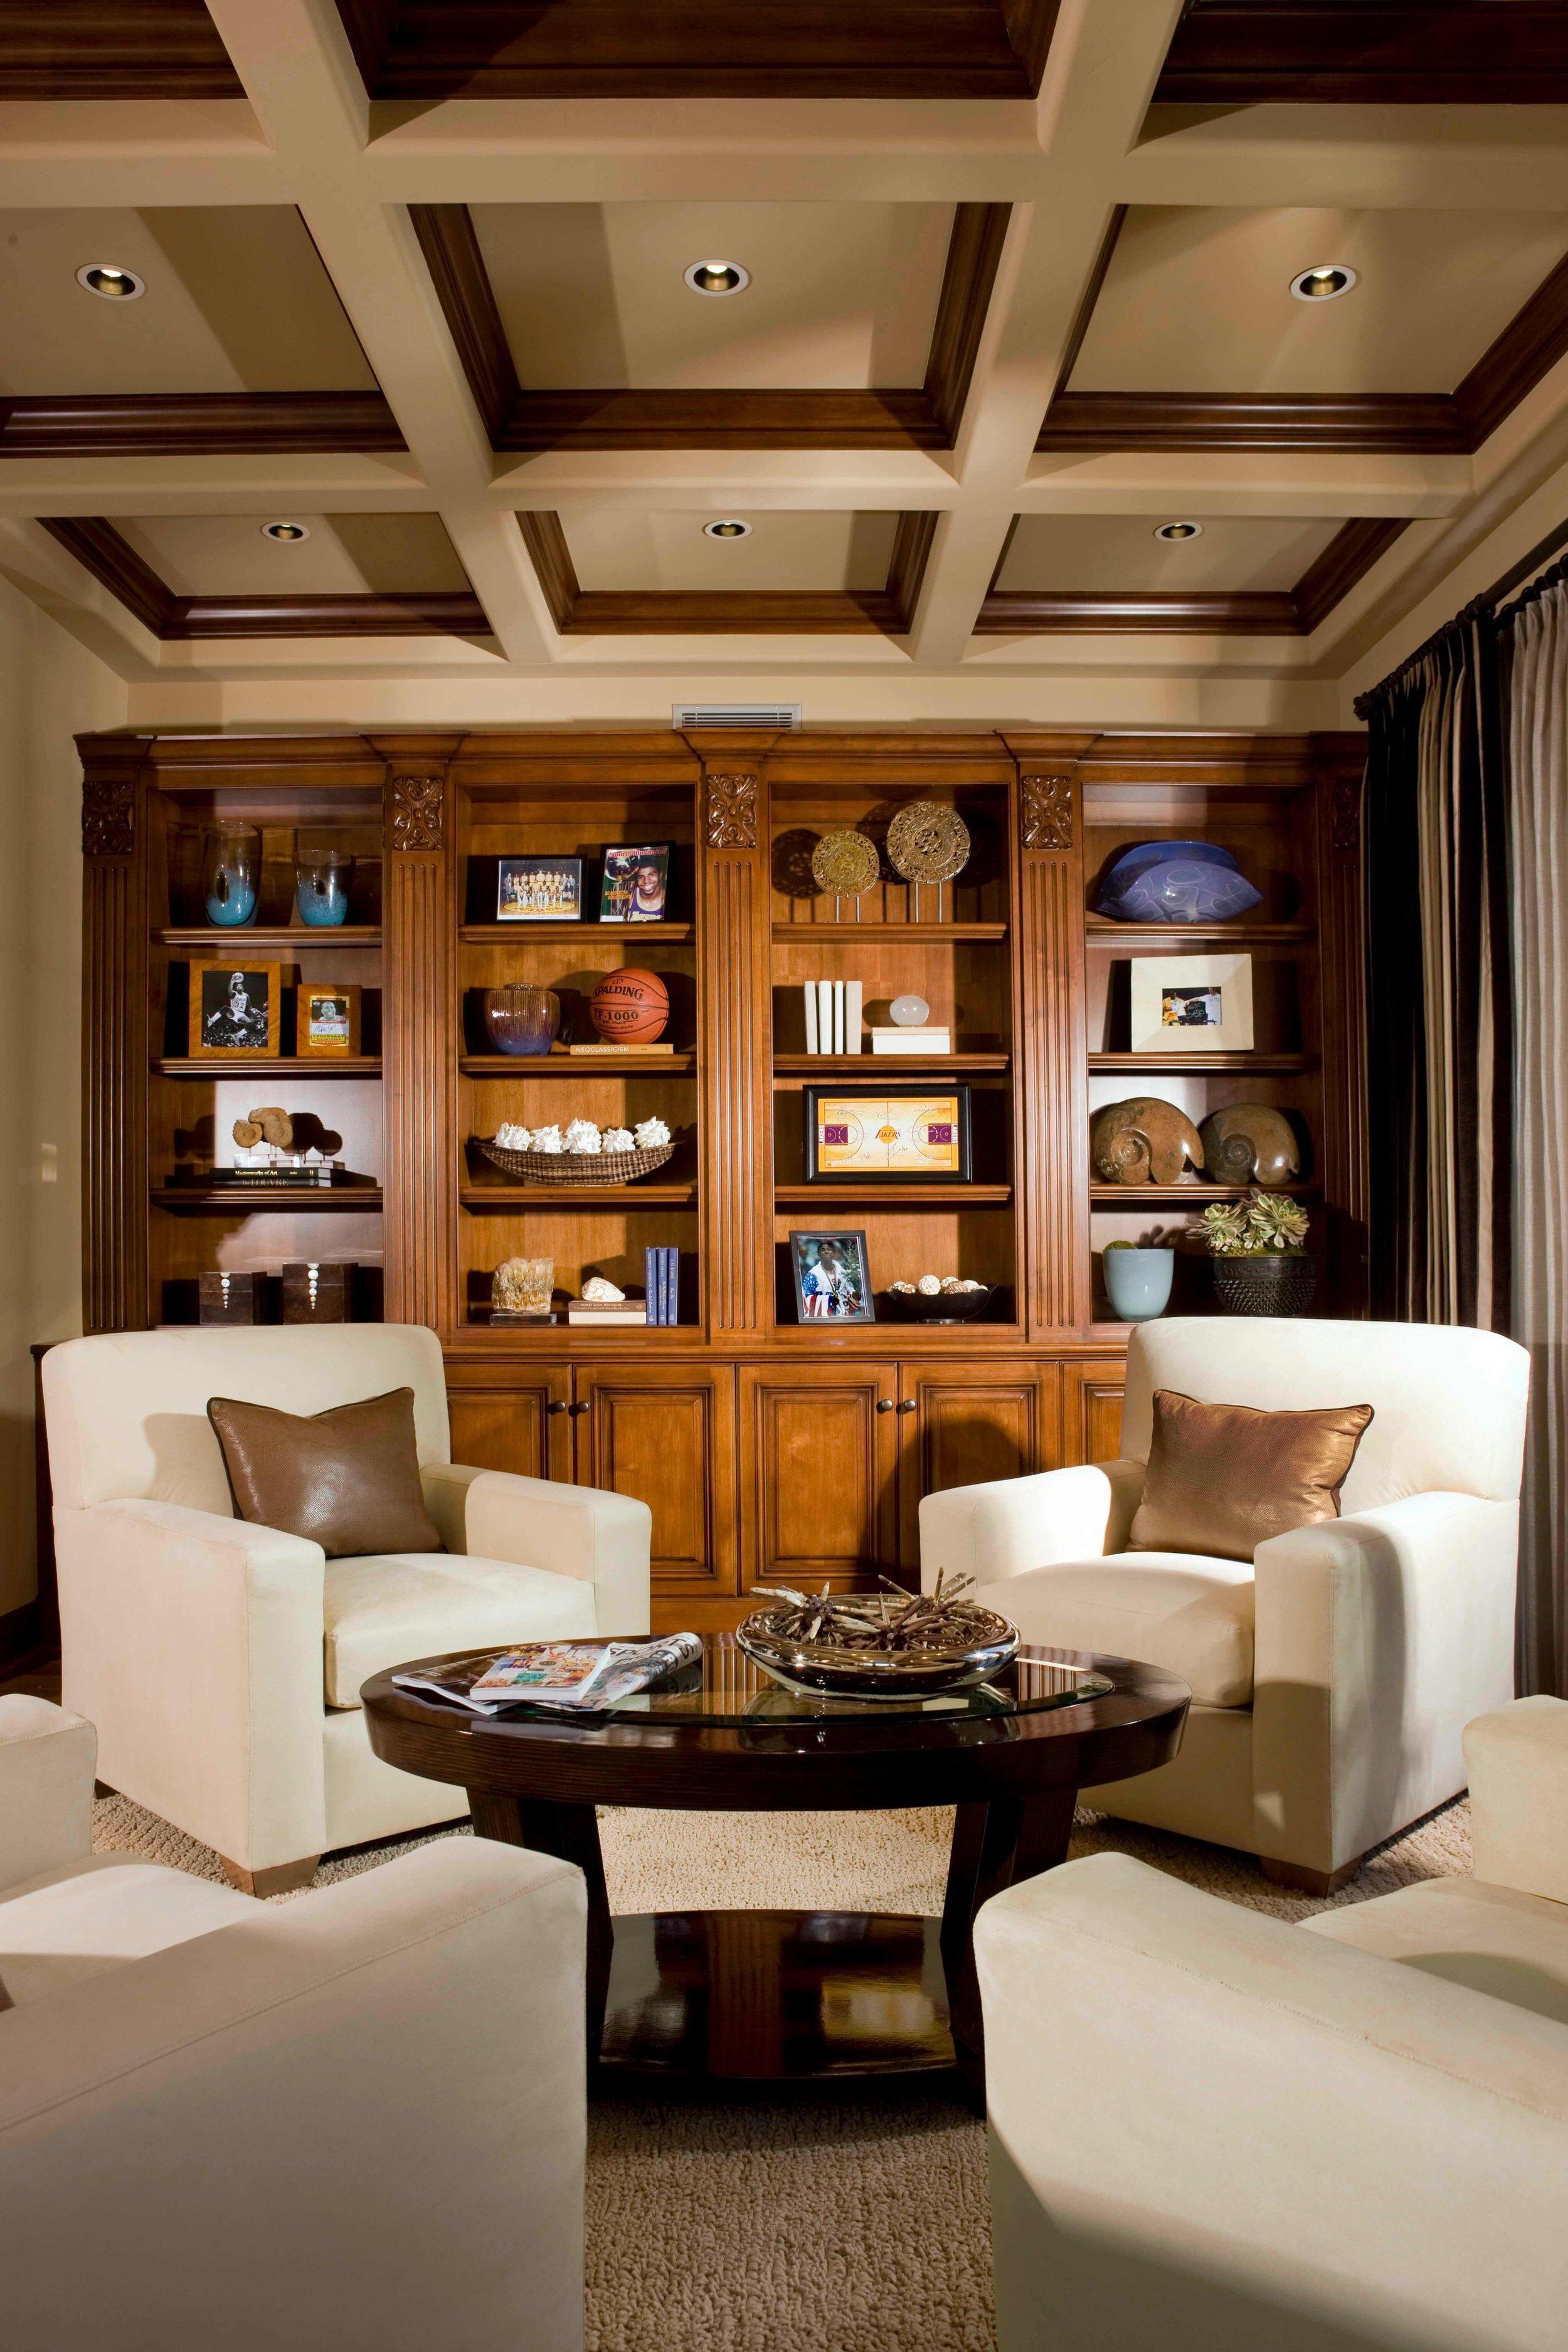 elizabeth-tapper-interiors-ritz-cove-laguna-library-man-cave-club-chairs-office.jpg